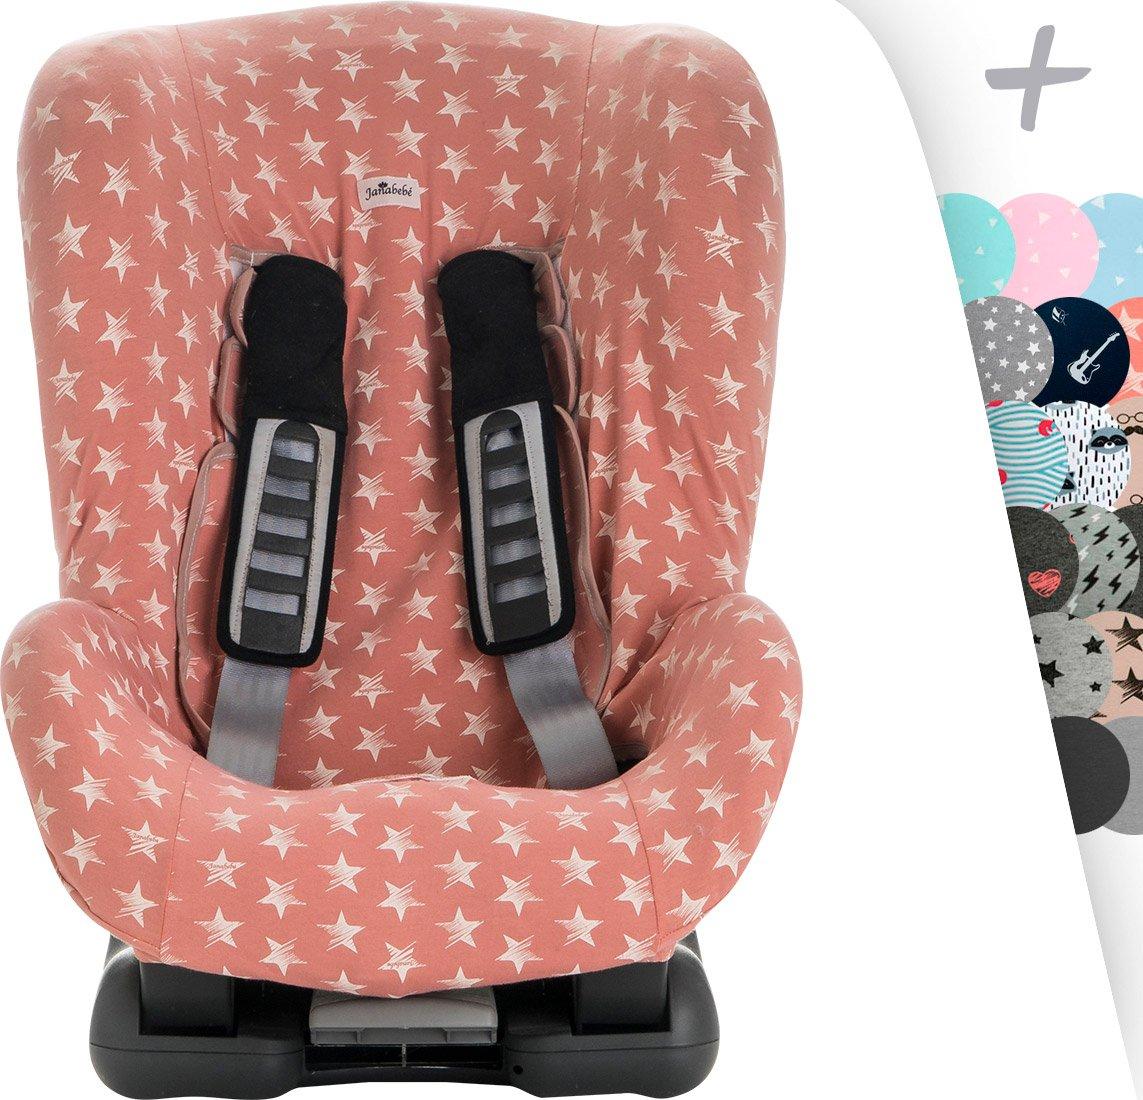 JANABEBE Schutzh/ülle Universal f/ür Auto-Kindersitz Gruppe 1 BLACK RAYO 2 und 3